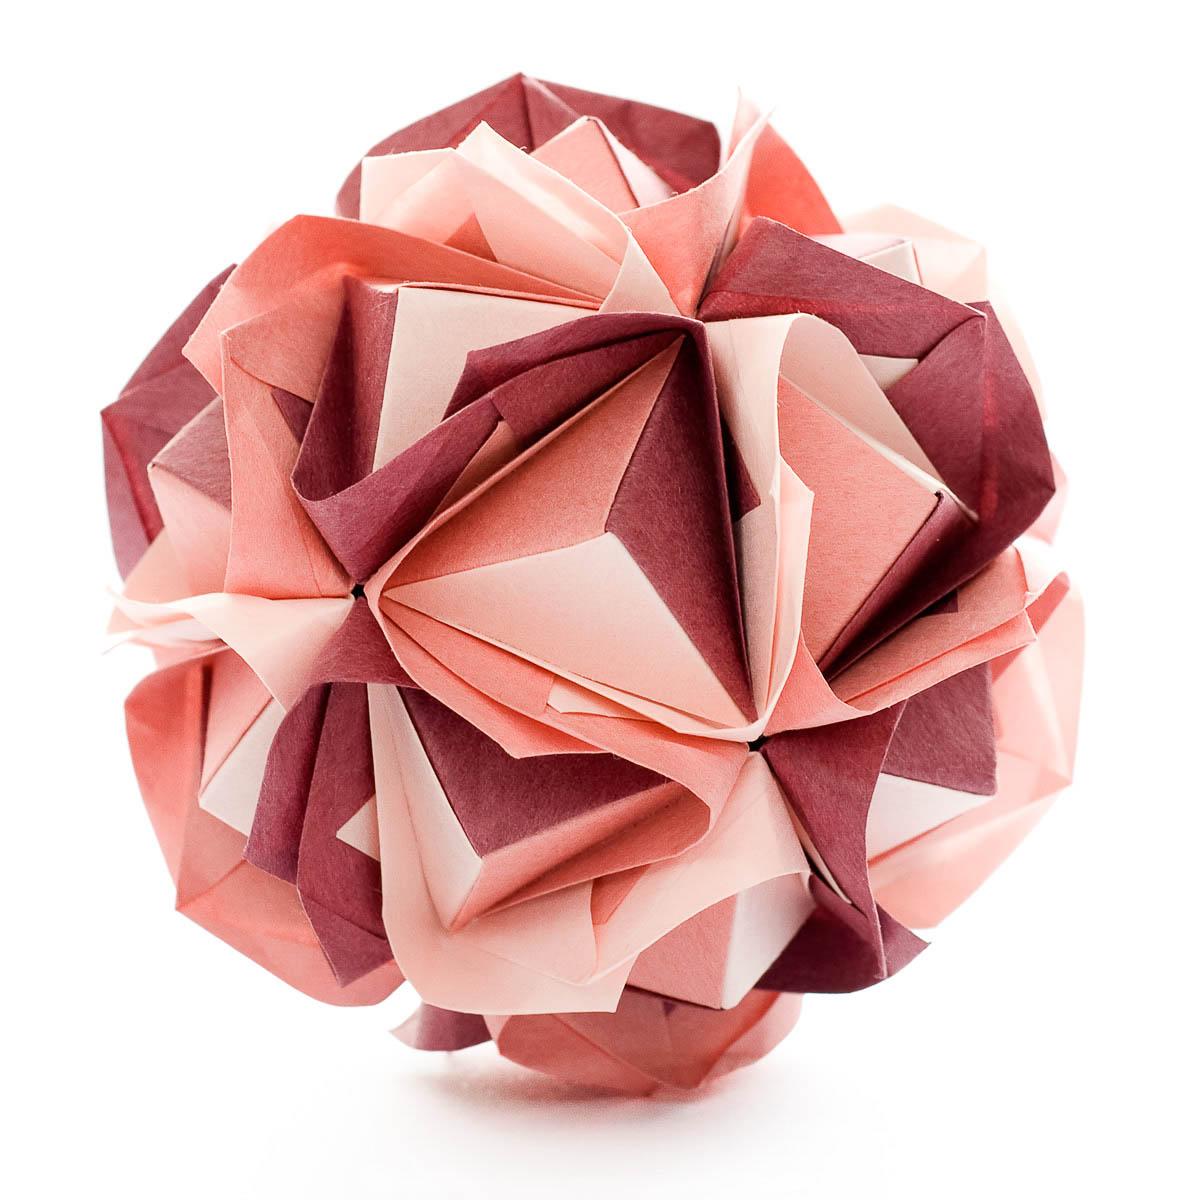 89 Origami Flower Ball Instructions Step By Kusudama Flowers Diagrams Clover Maria Sinayskaya Diagram